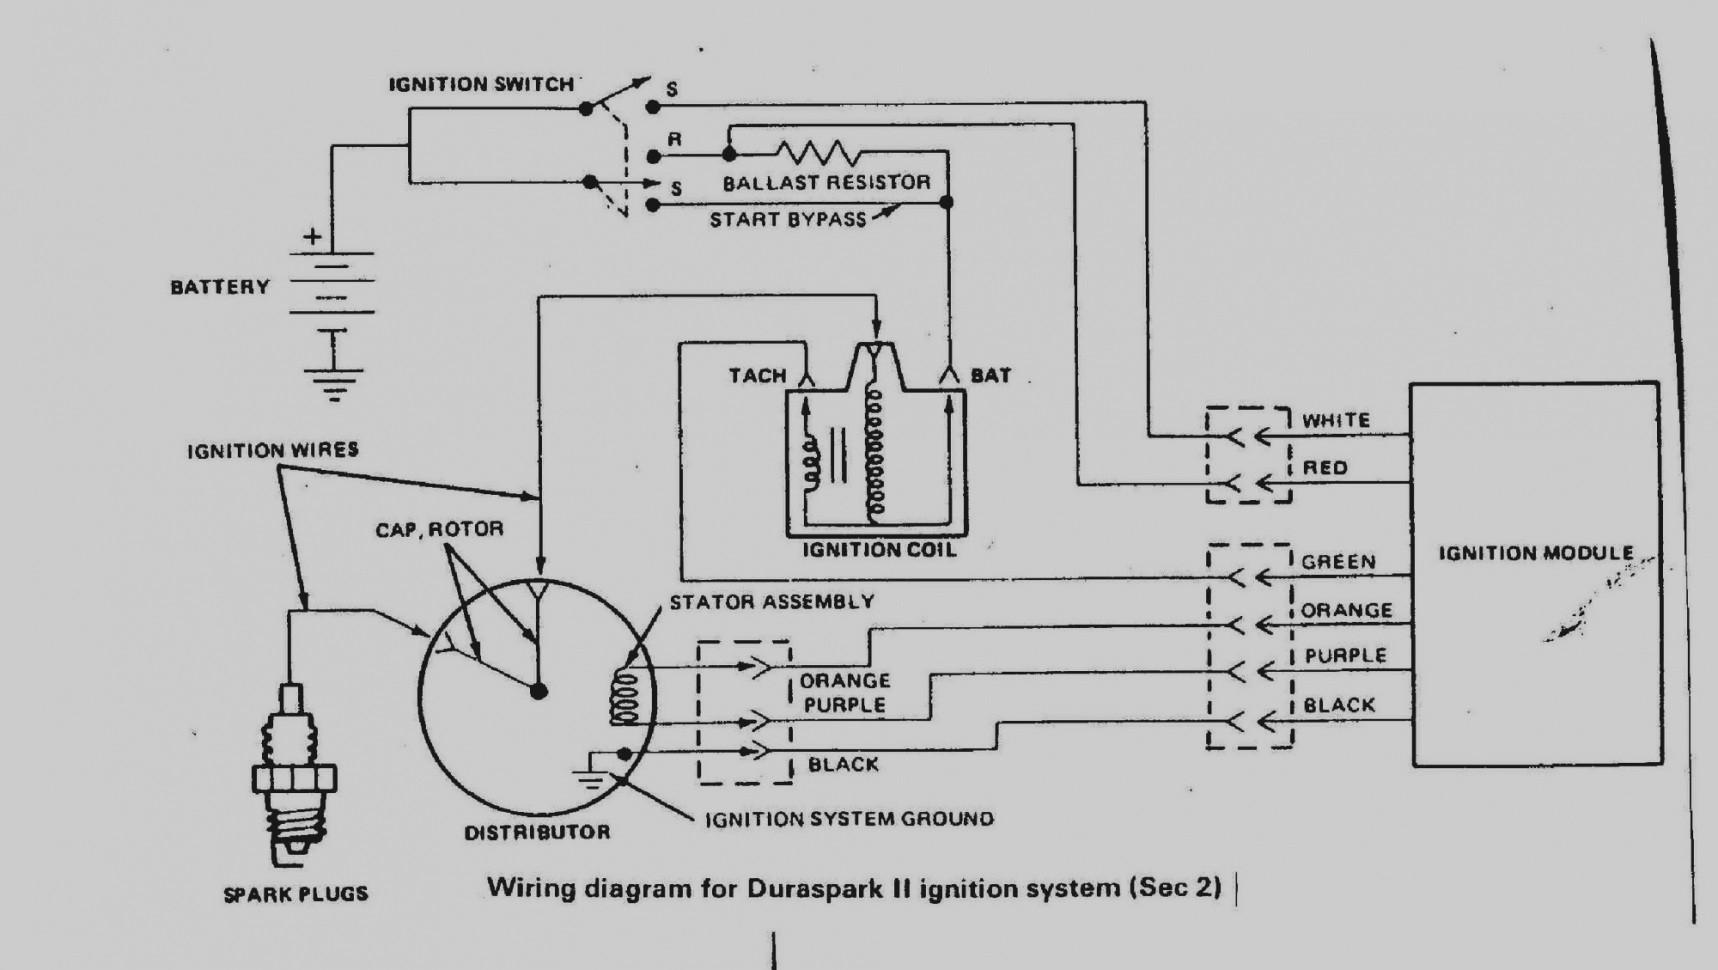 Unique Duraspark Wiring Diagram Free Image 1989 Ford Ignition Module